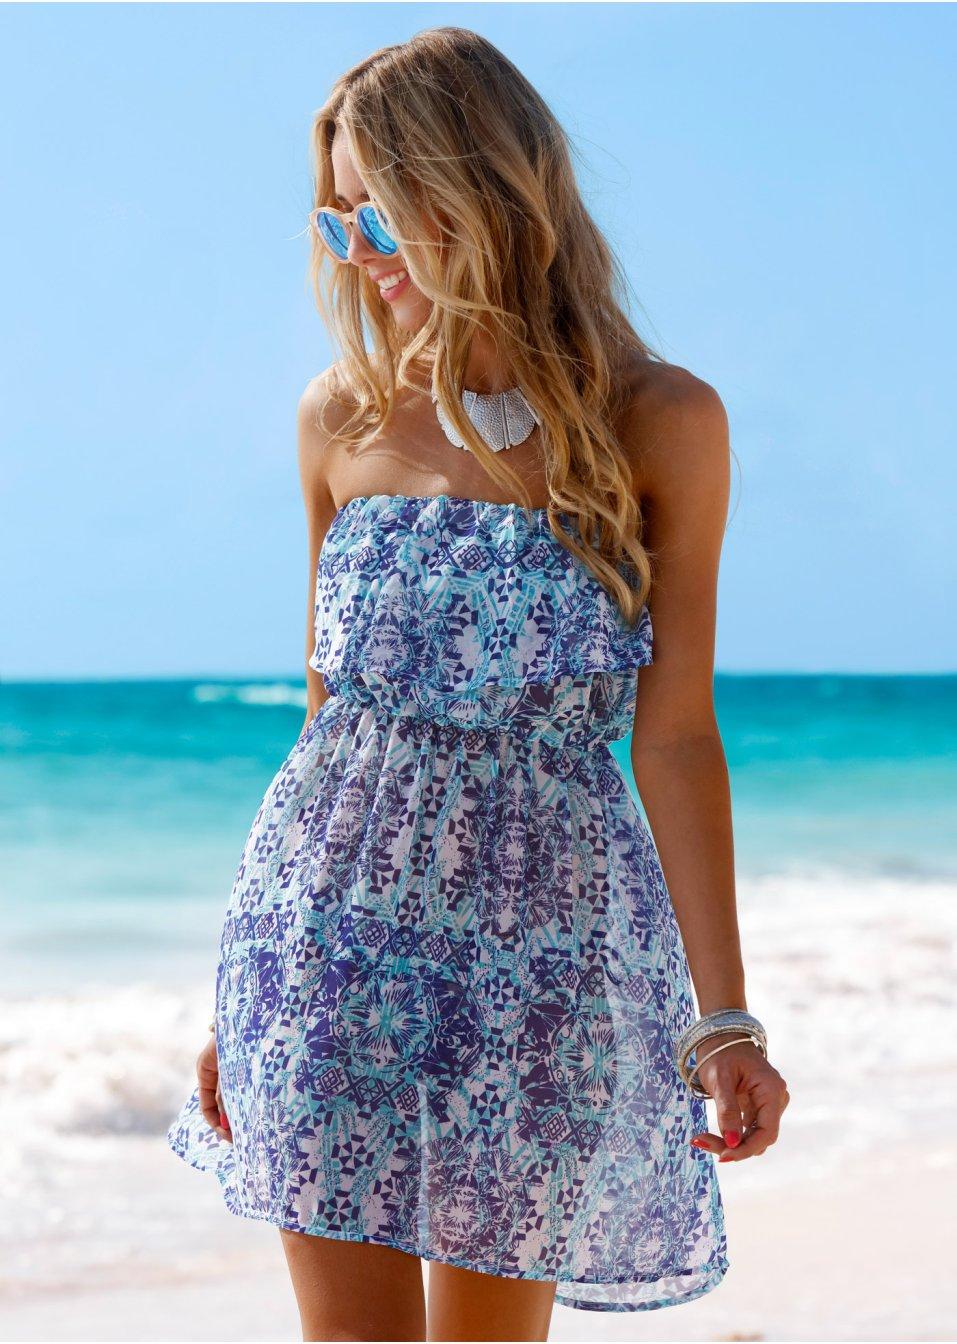 Летние платья для отдыха на море фото